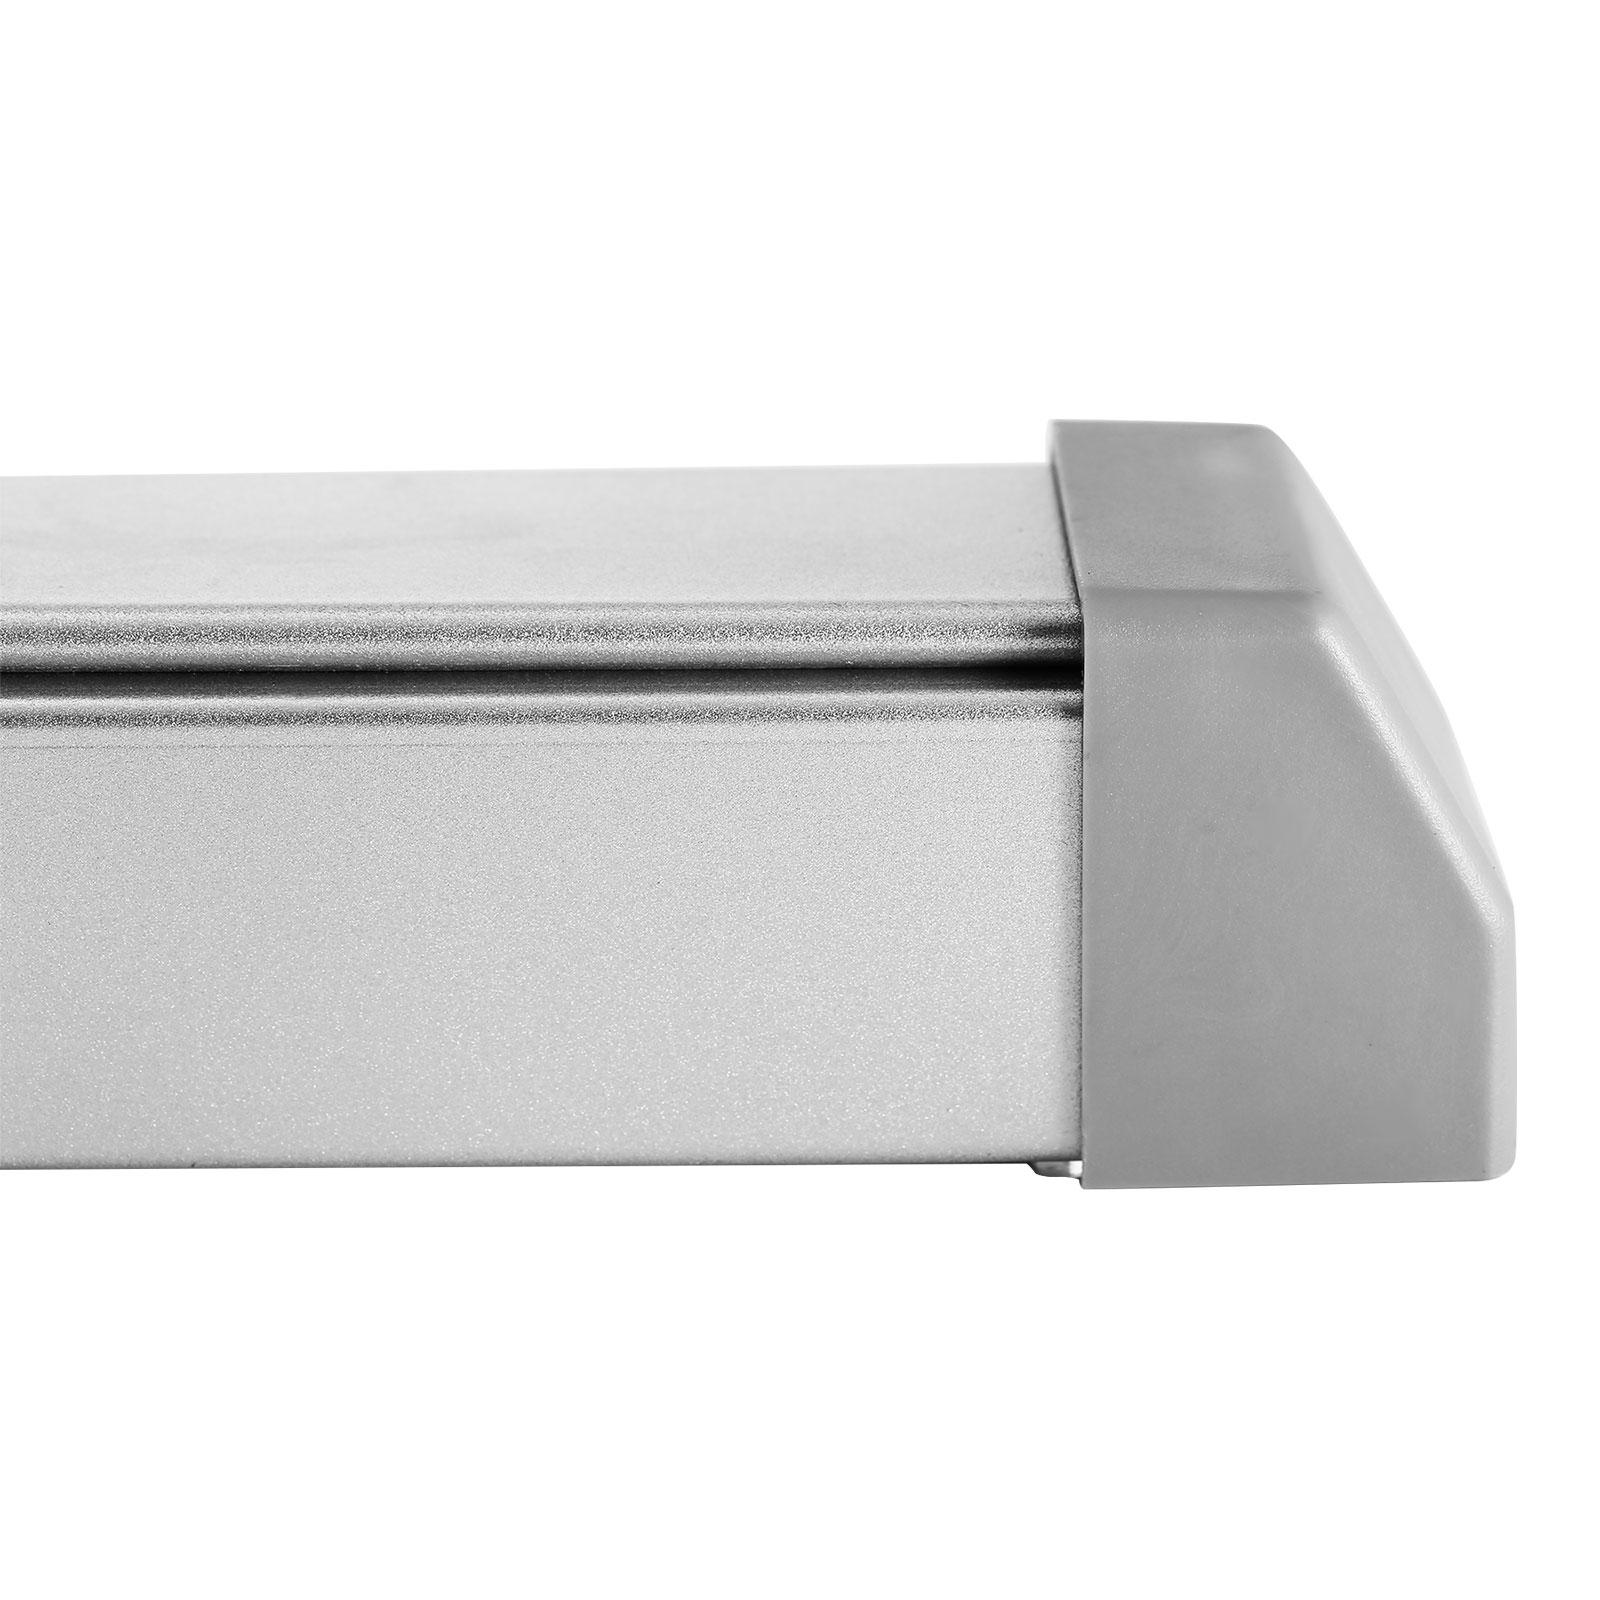 Door Push Bar Panic Exit Device With Handle Heavy Duty